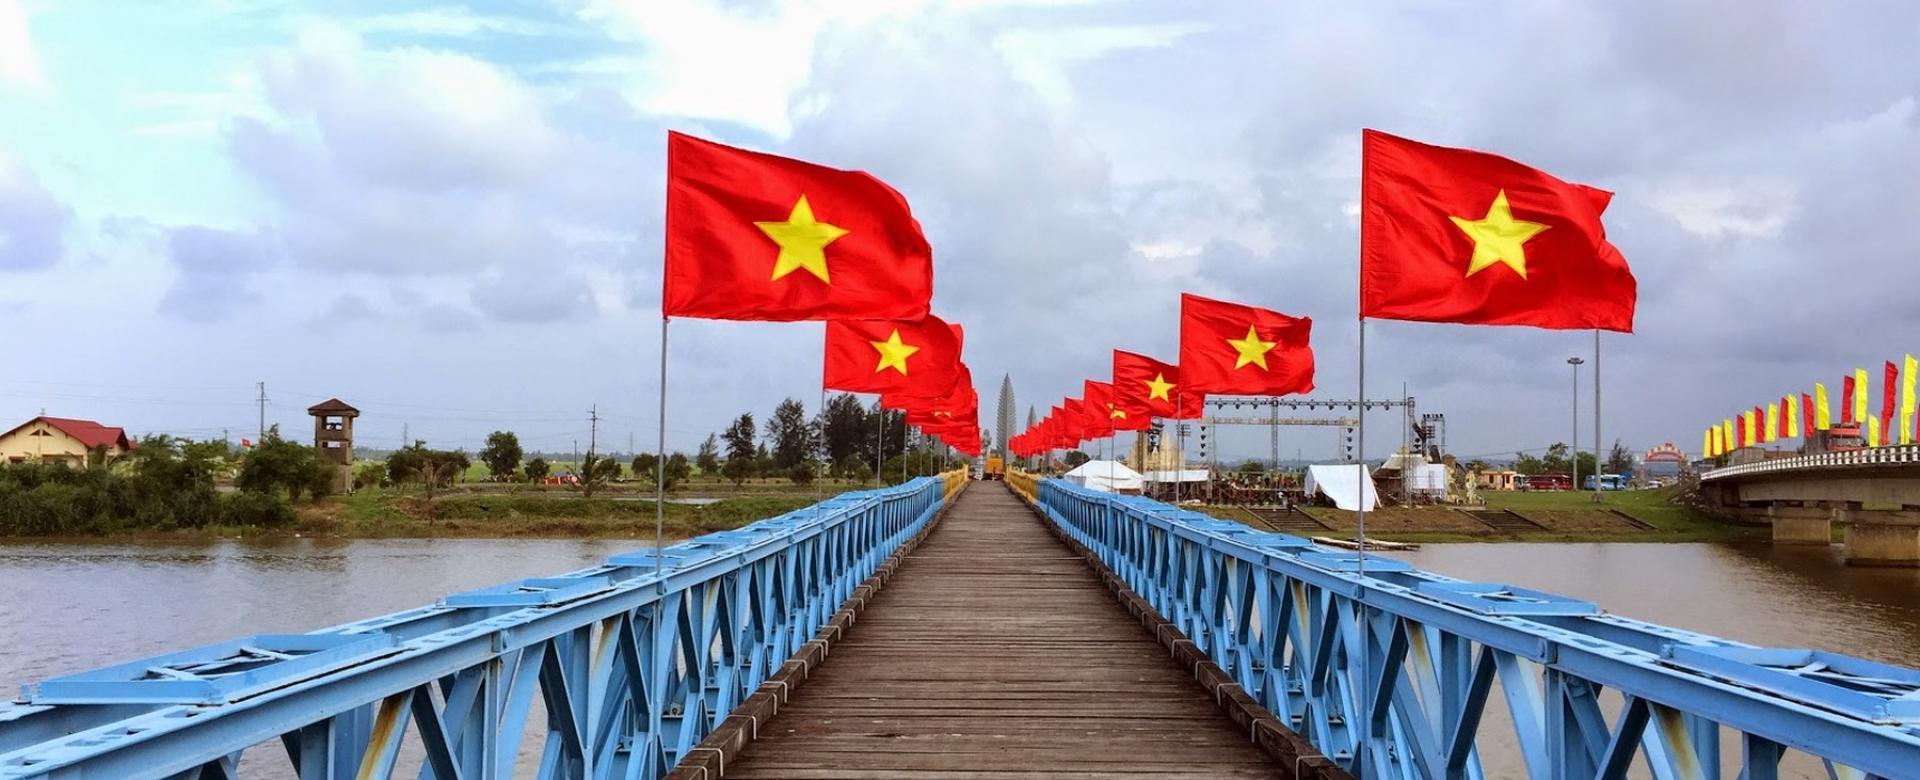 Cycling to DMZ Quang Tri & Dong Hoi